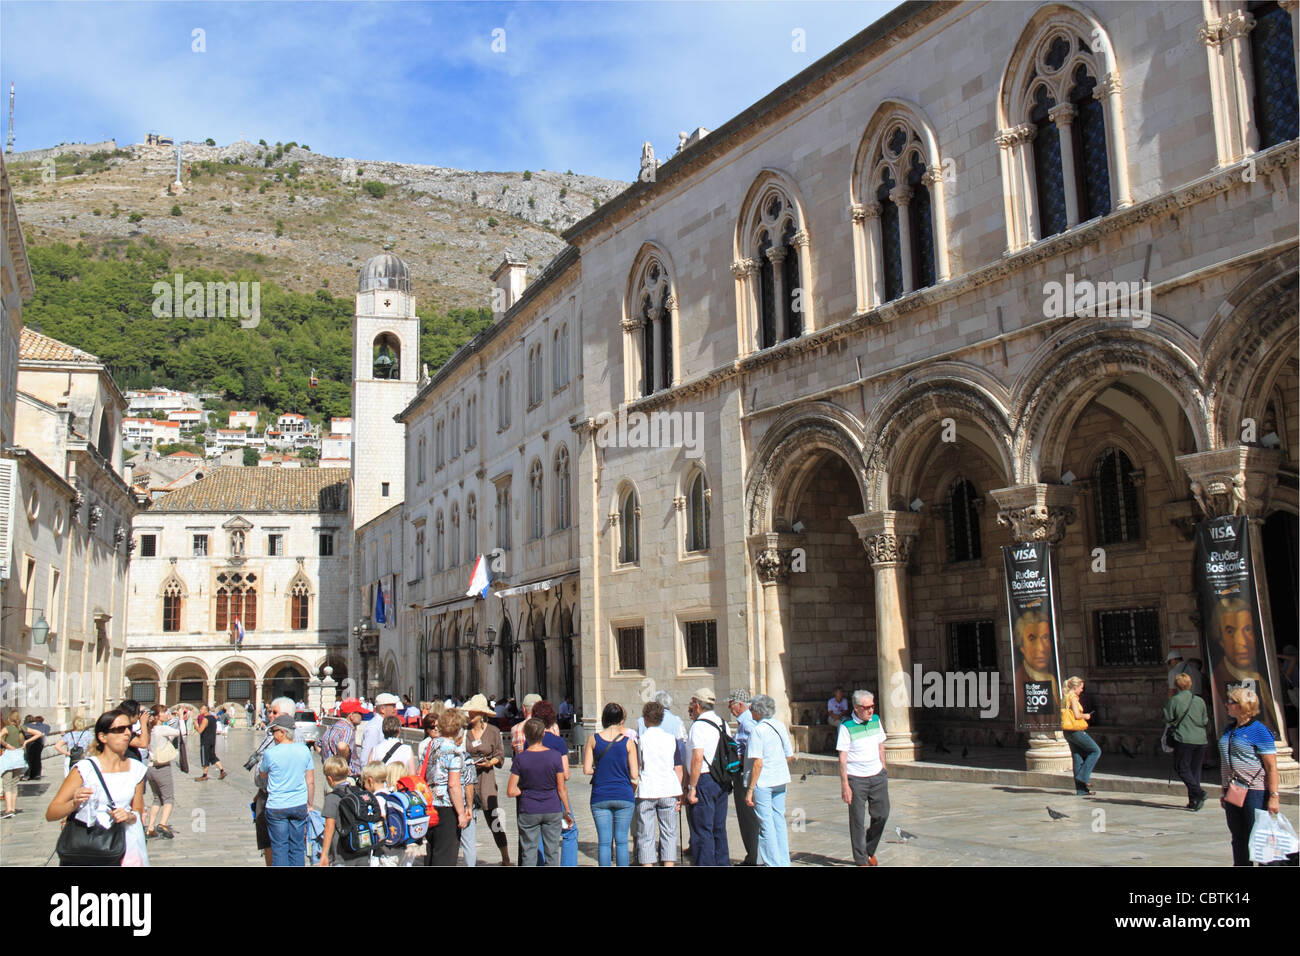 Rector's Palace, City Hall and Sponza Palace, Dubrovnik, Dubrovnik-Neretva, Dalmatia, Croatia, Balkans, Adriatic - Stock Image